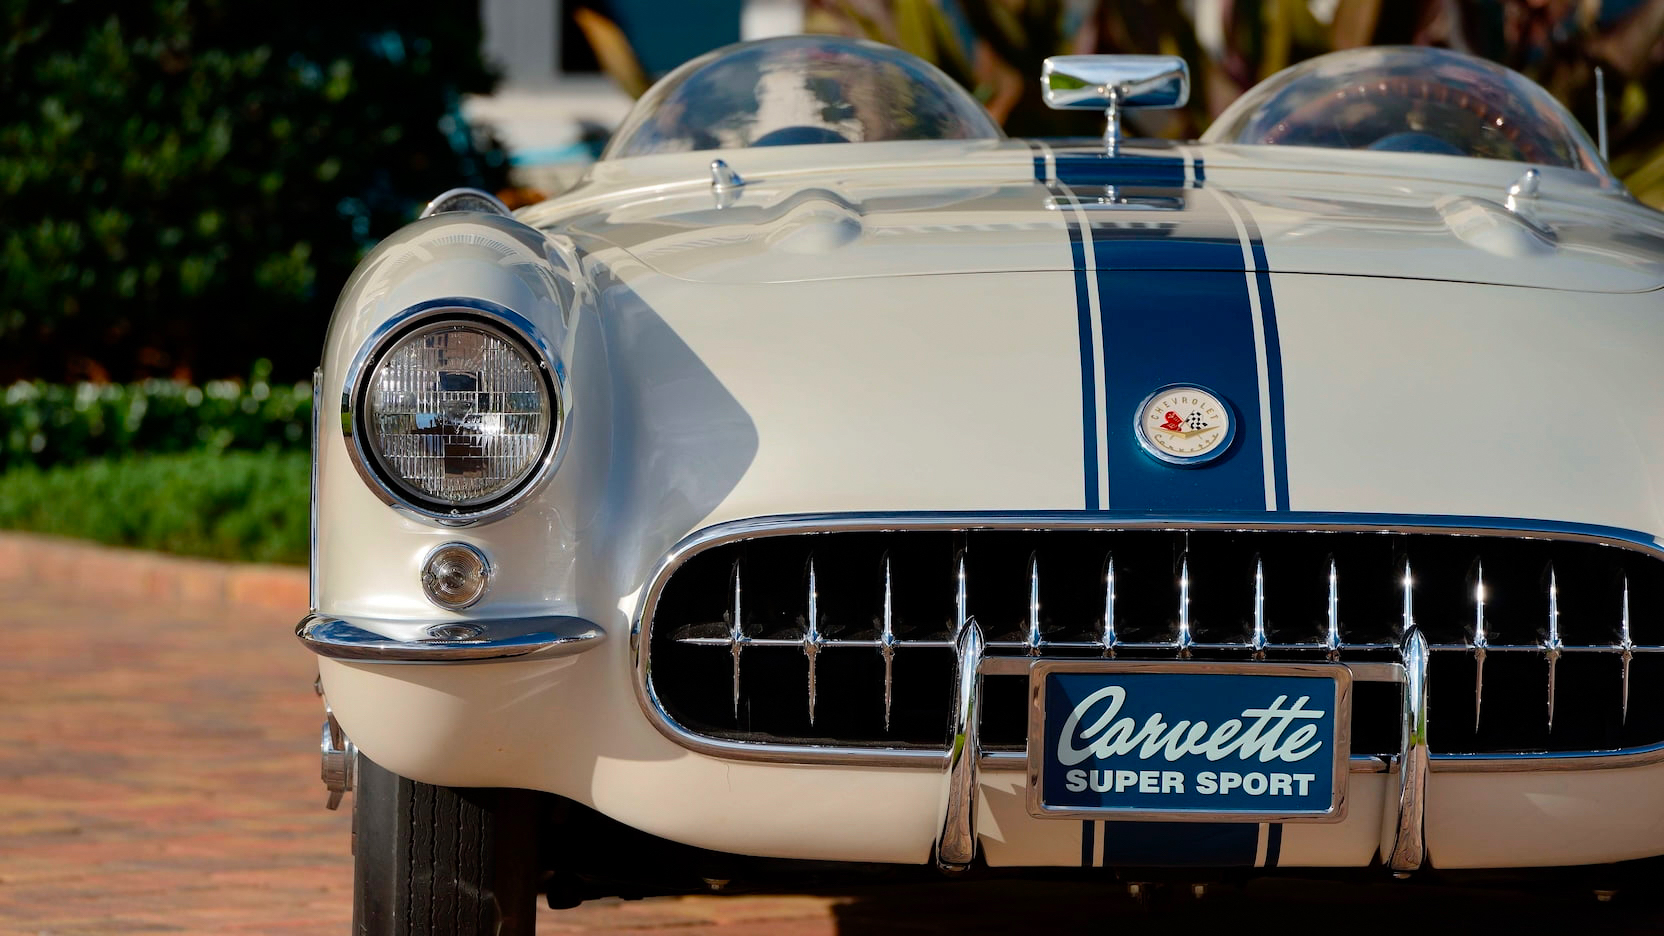 1957 Chevrolet Corvette Super Sport Concept Car 11_